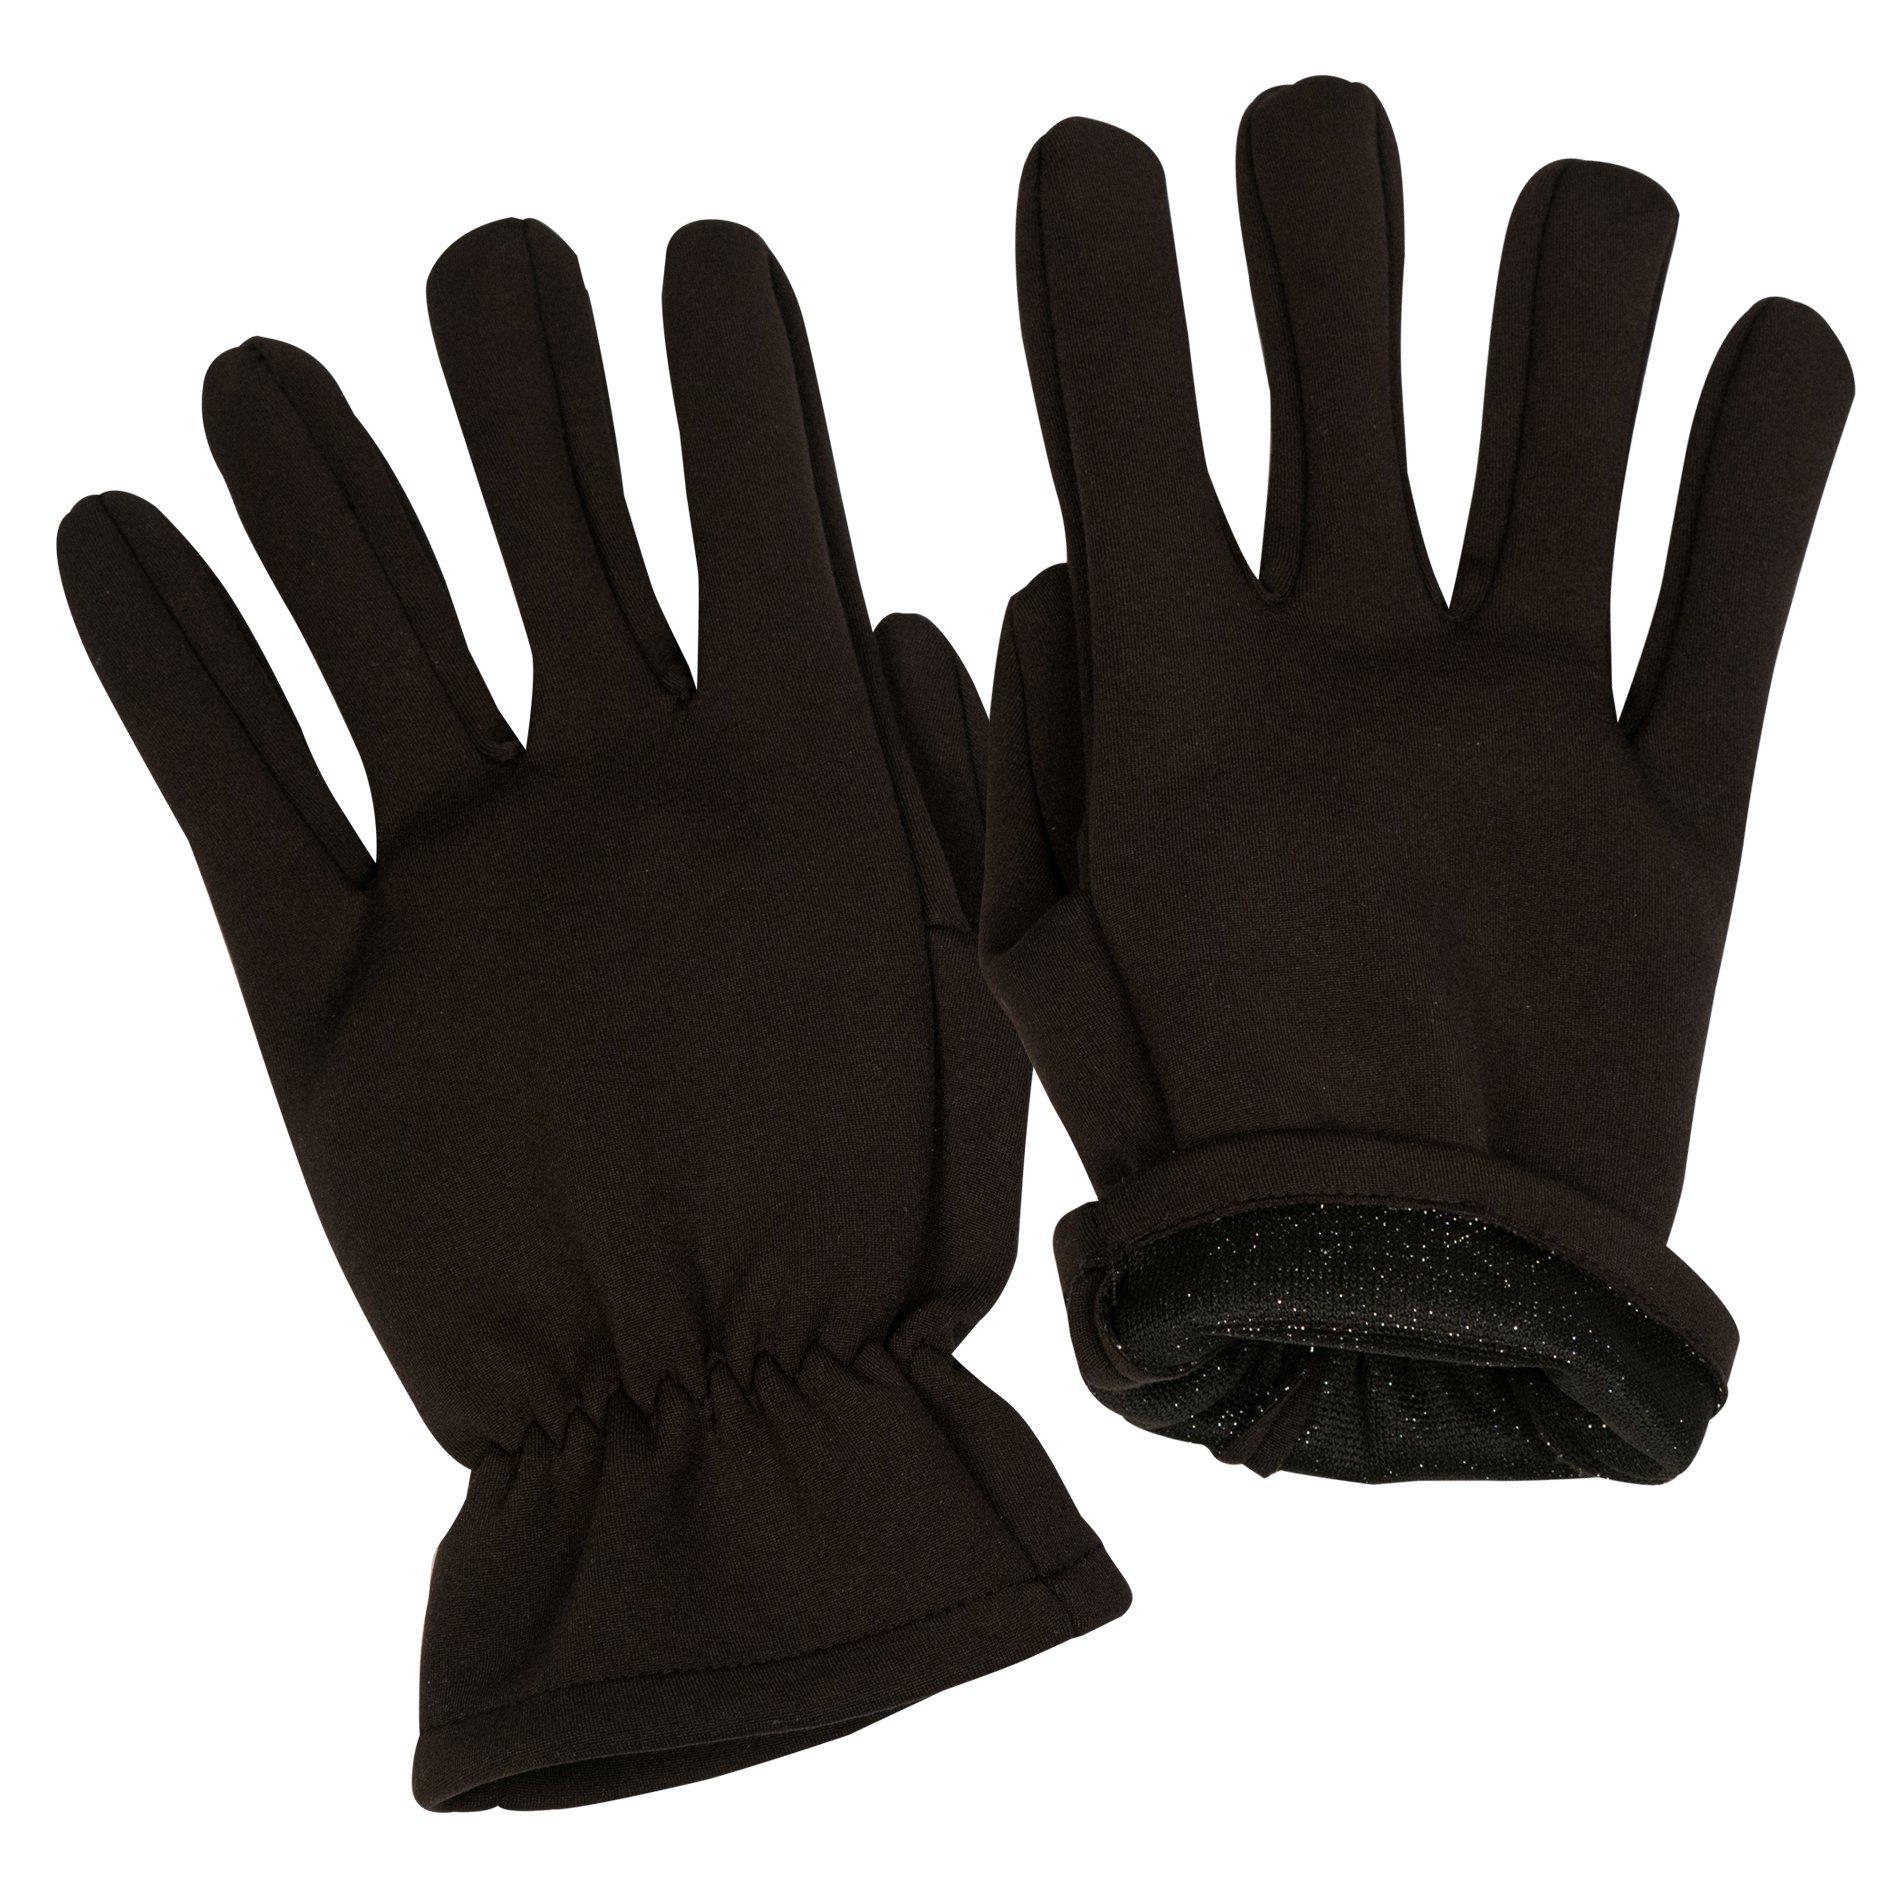 35 Below Gloves - 1 pair in Black for Men One Size